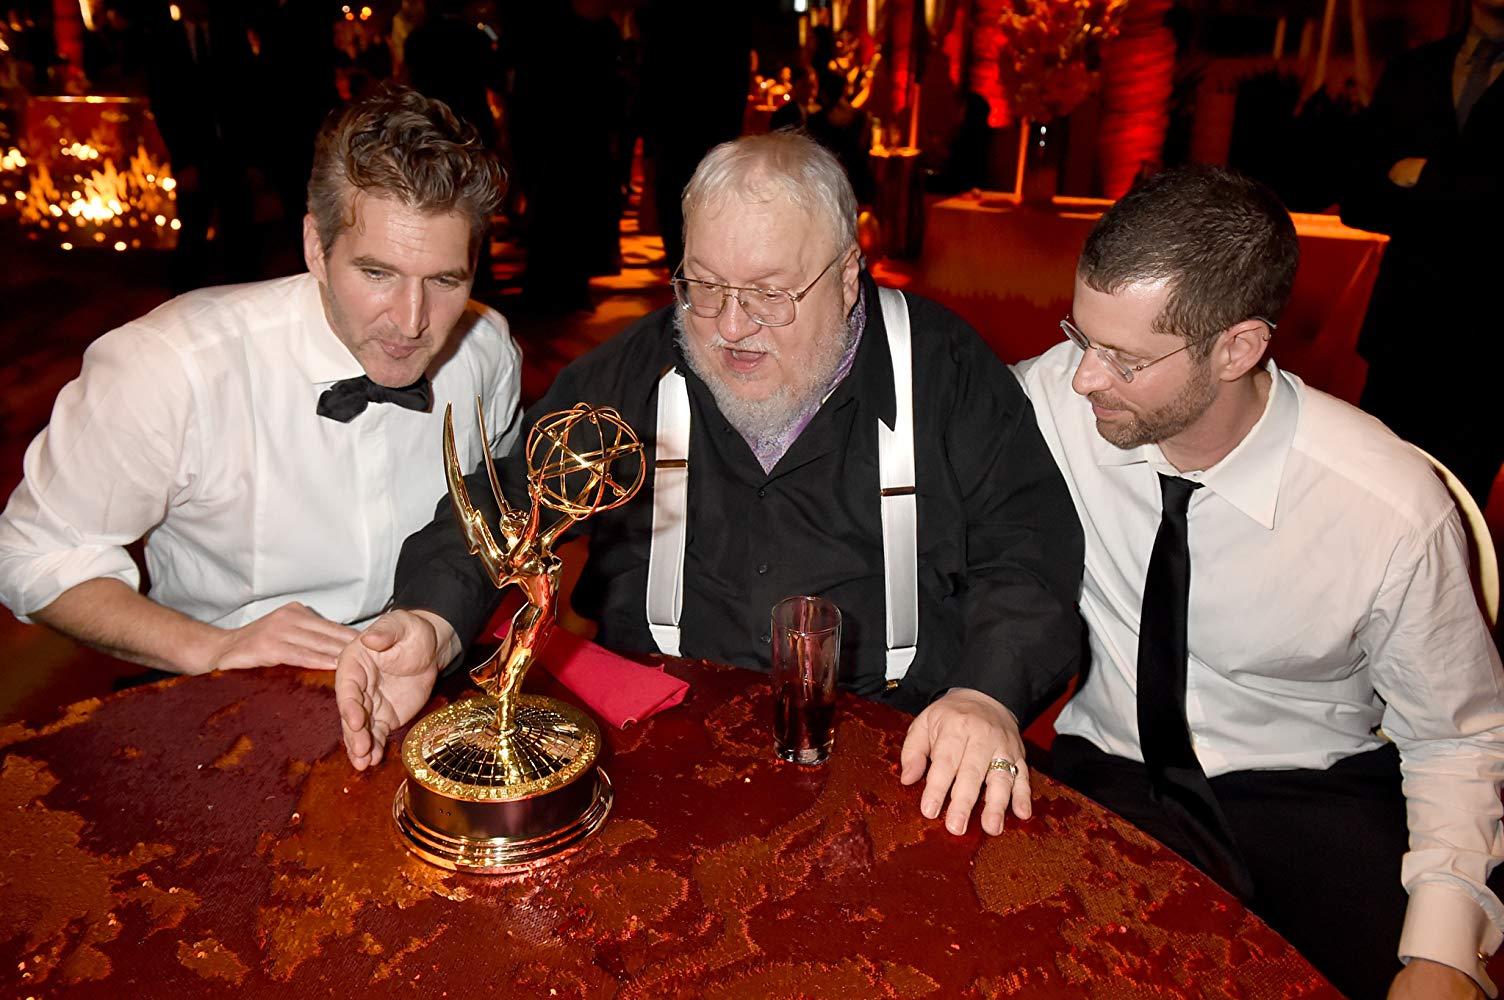 George R.R. Martin, David Benioff, e D.B. Weiss durante o 67º Emmy - 2015 (Fonte: IMDb/Reprodução)